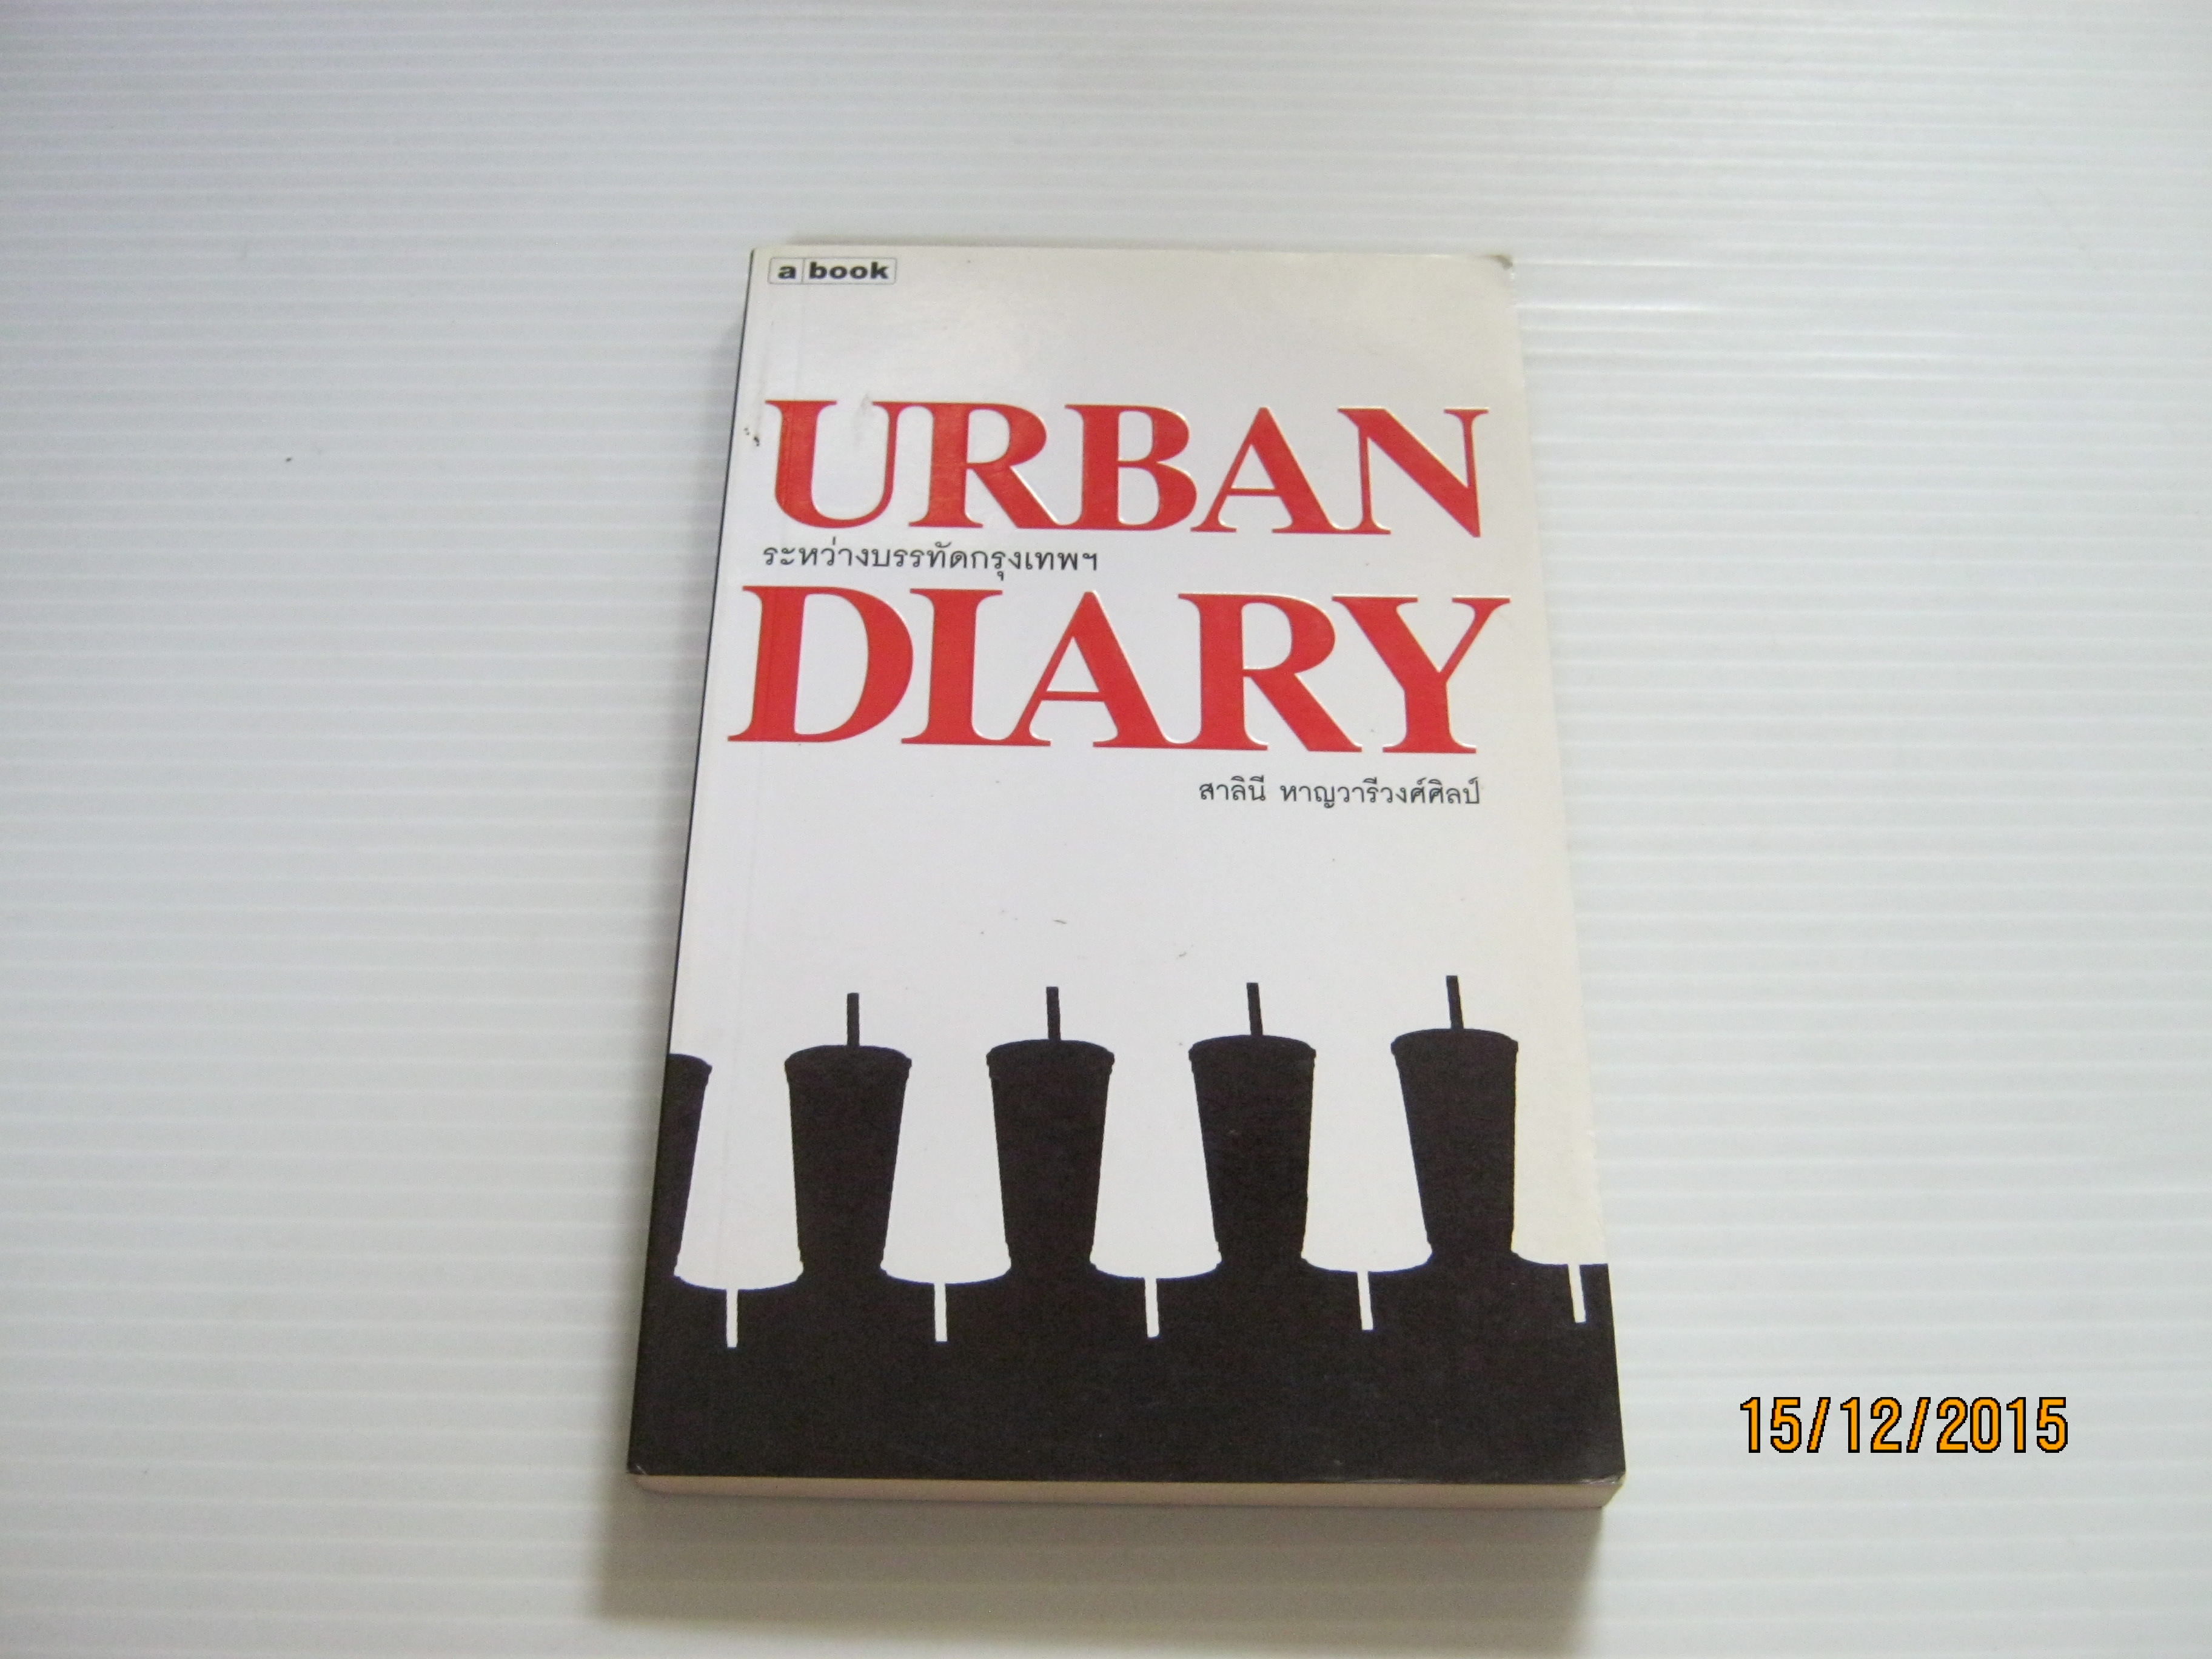 Urban Diary ระหว่างบรรทัดกรุงเทพฯ สาลินี หาญวารีวงศ์ศิลป์ เขียน